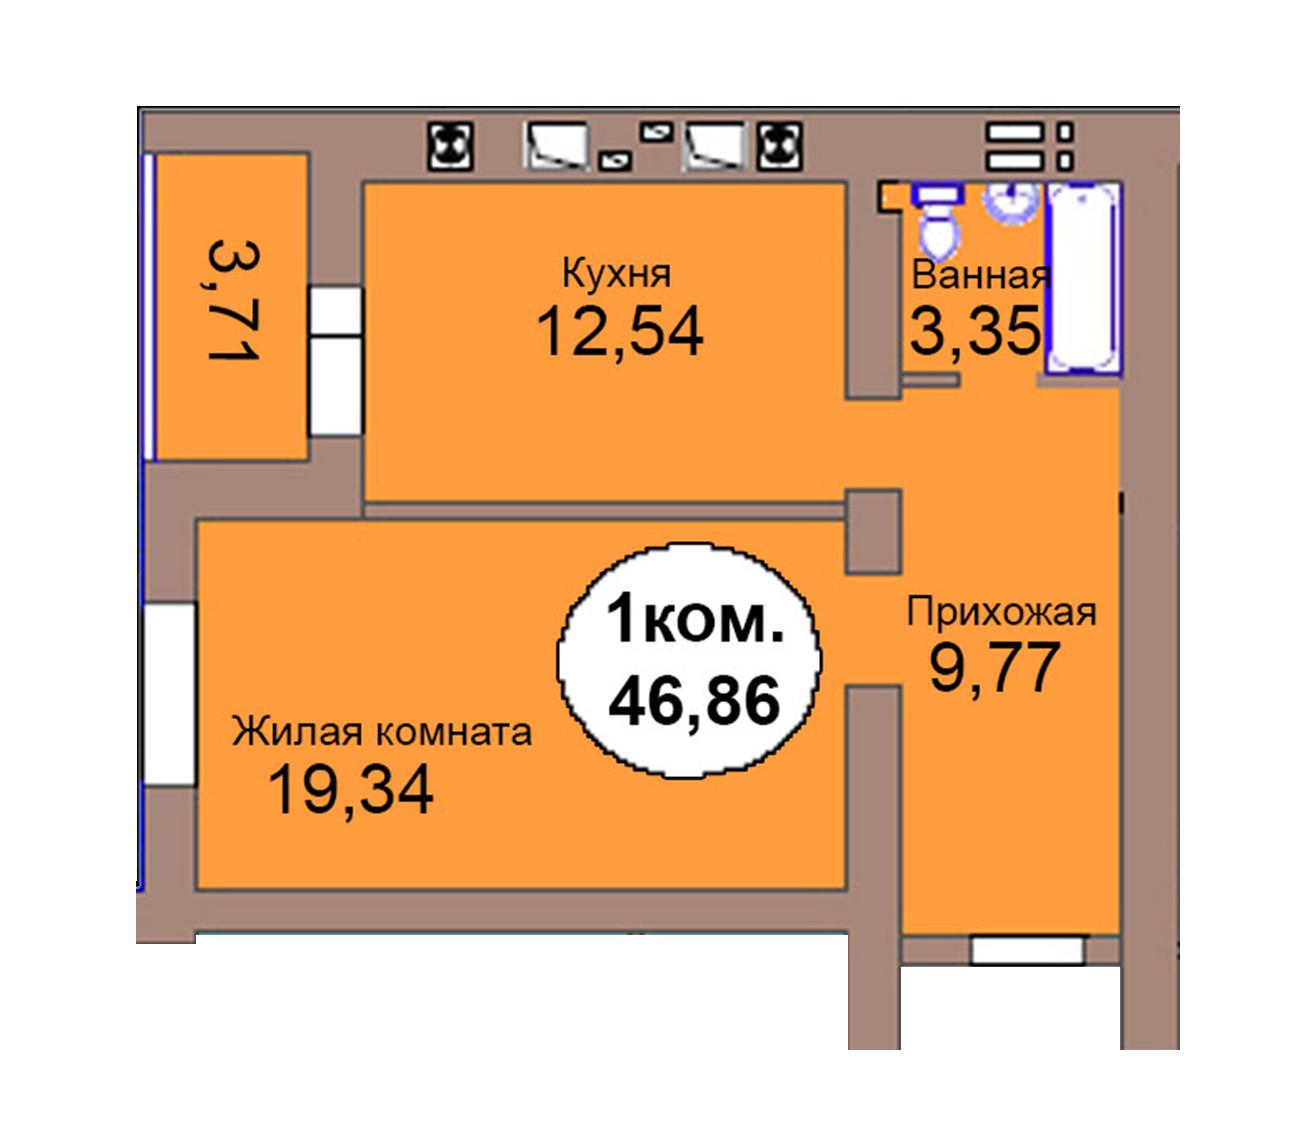 1-комн. кв. по пер. Калининградский, 4  кв. 77 в Калининграде